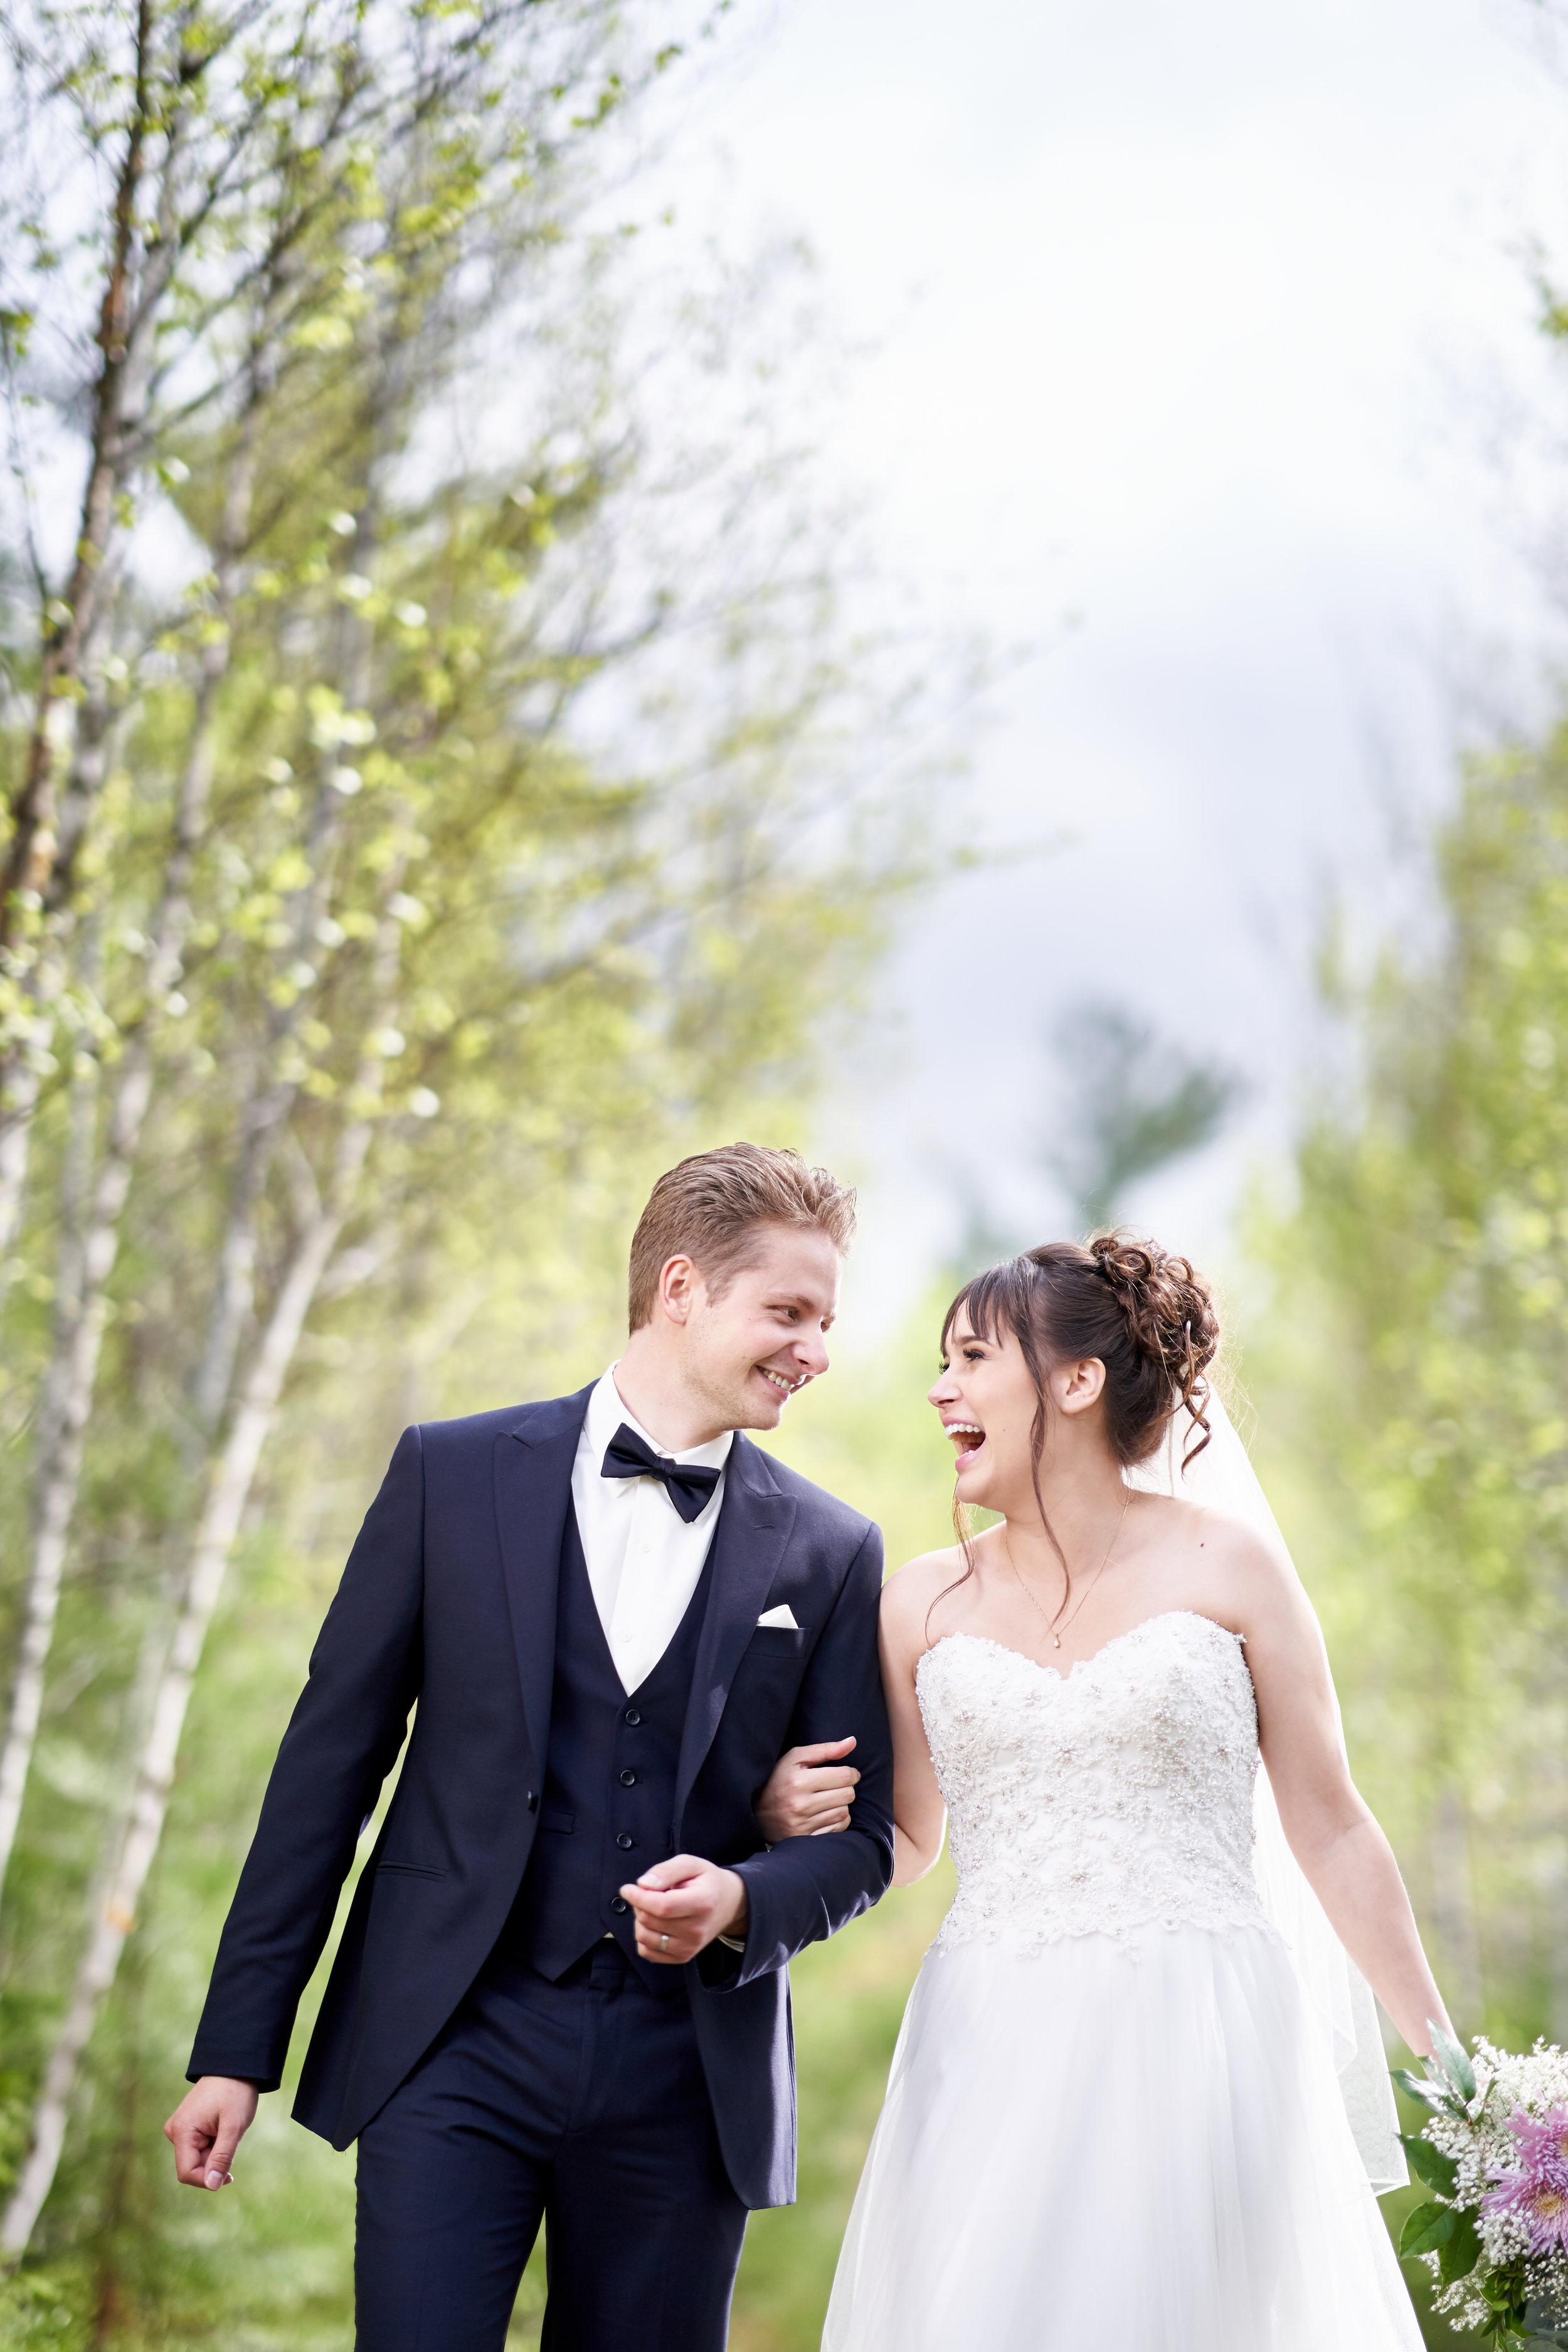 Marcia & Johannes' Wedding - 356.jpg